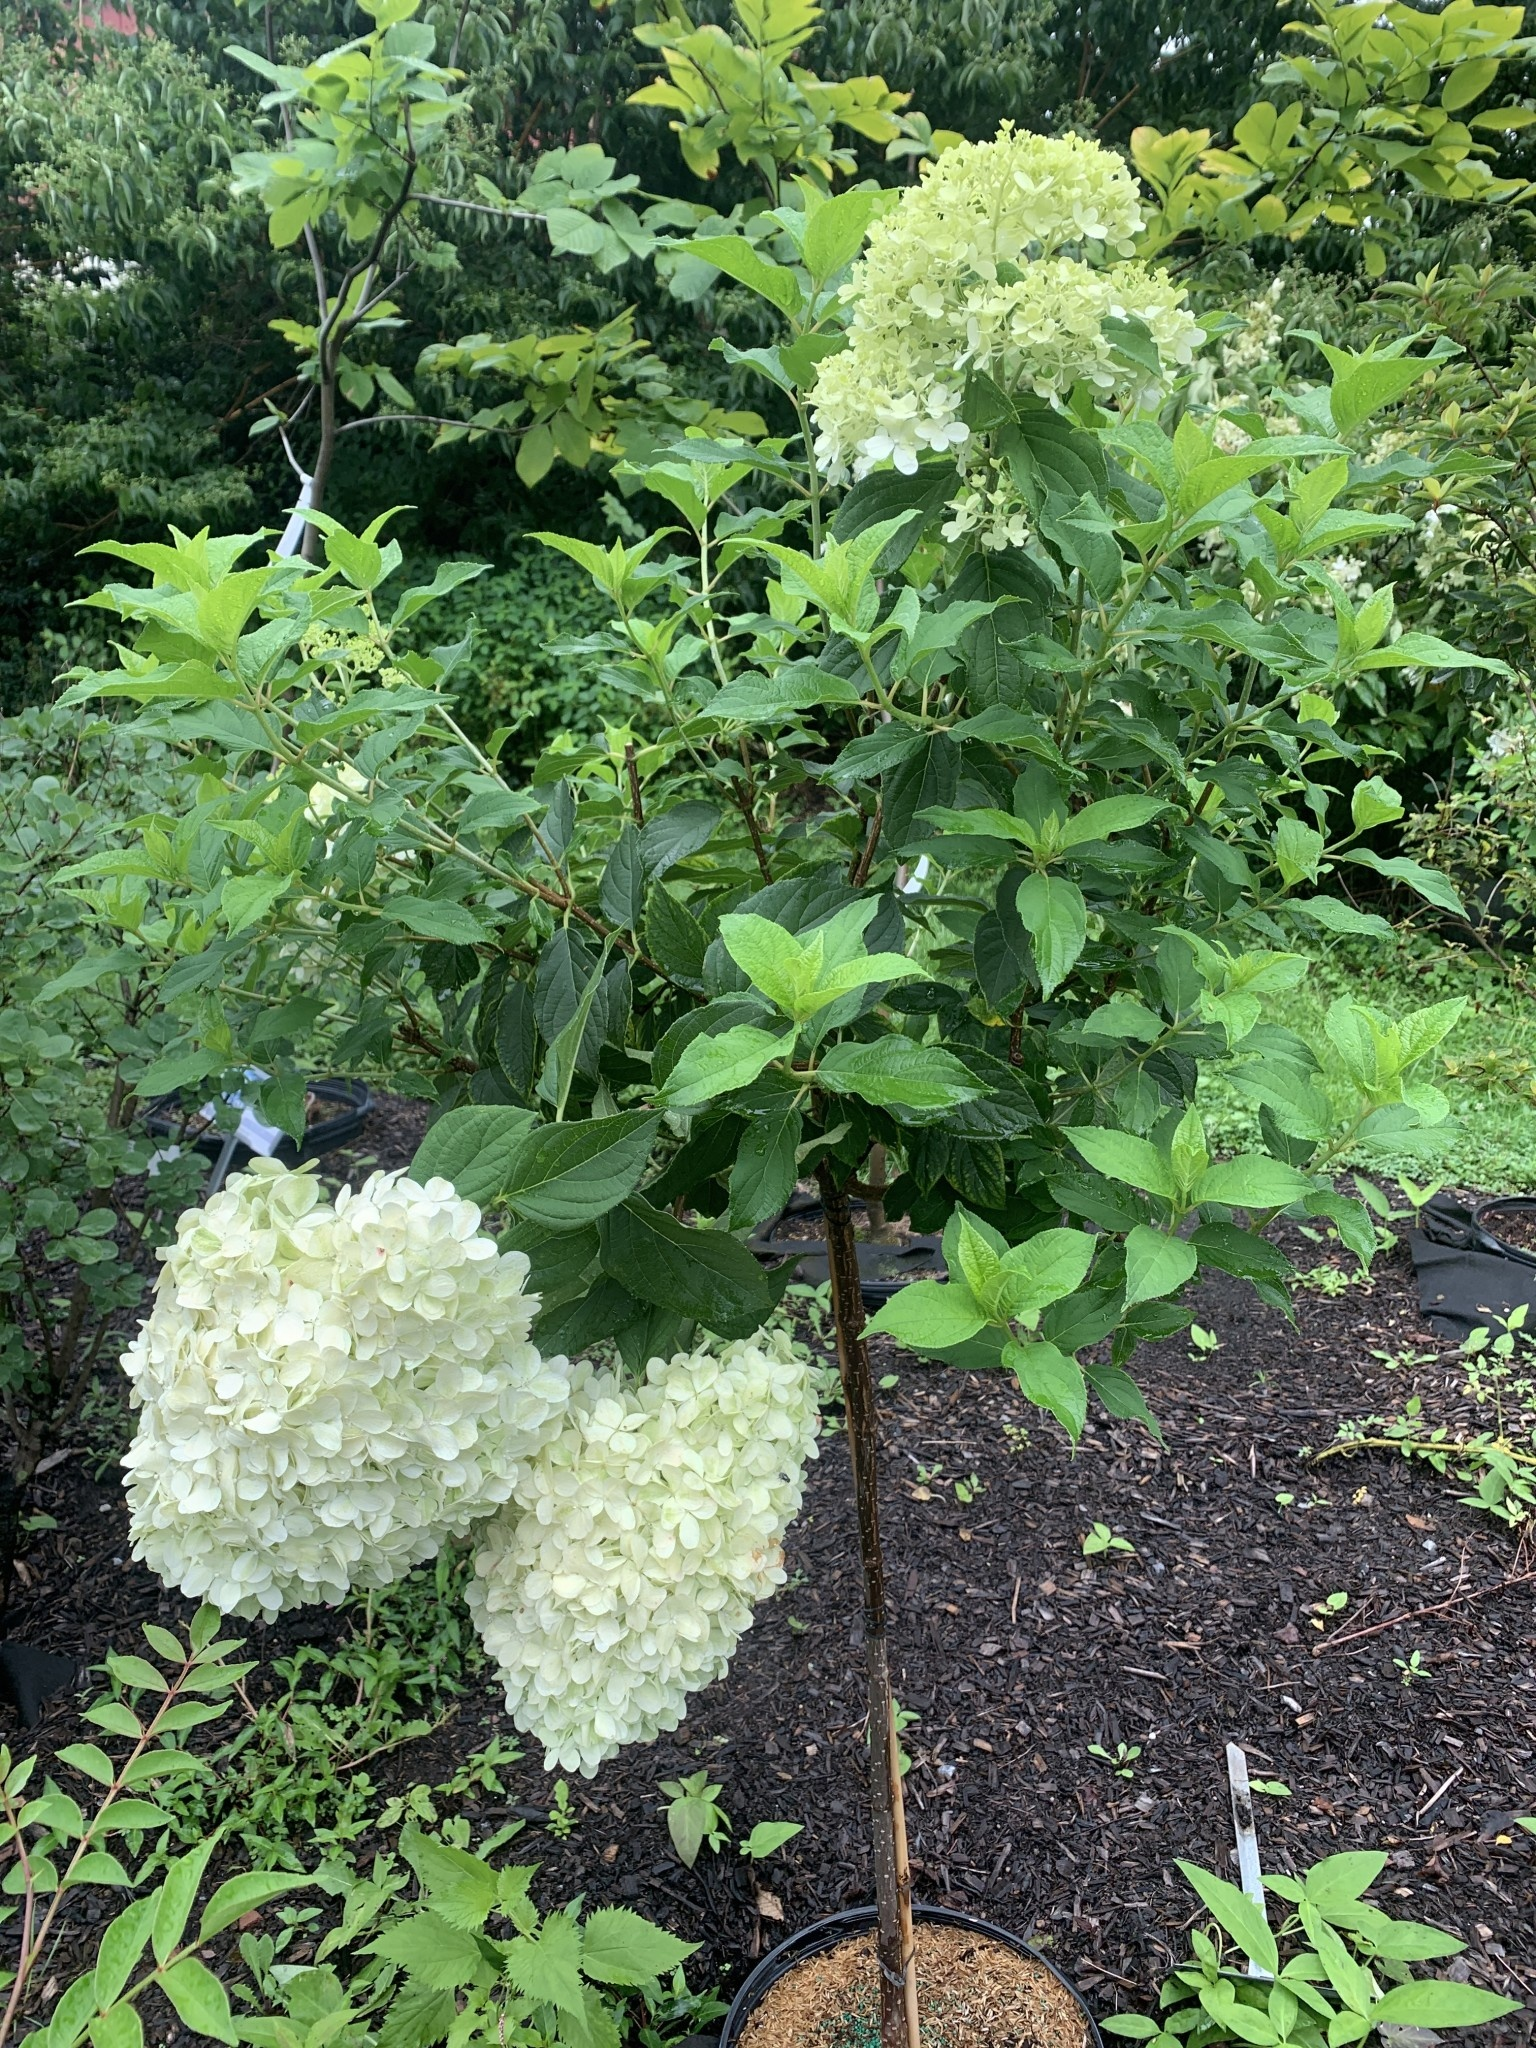 Hydrangea panic. Limelight Hydrangea - Hardy, Limelight, #7 tree Form